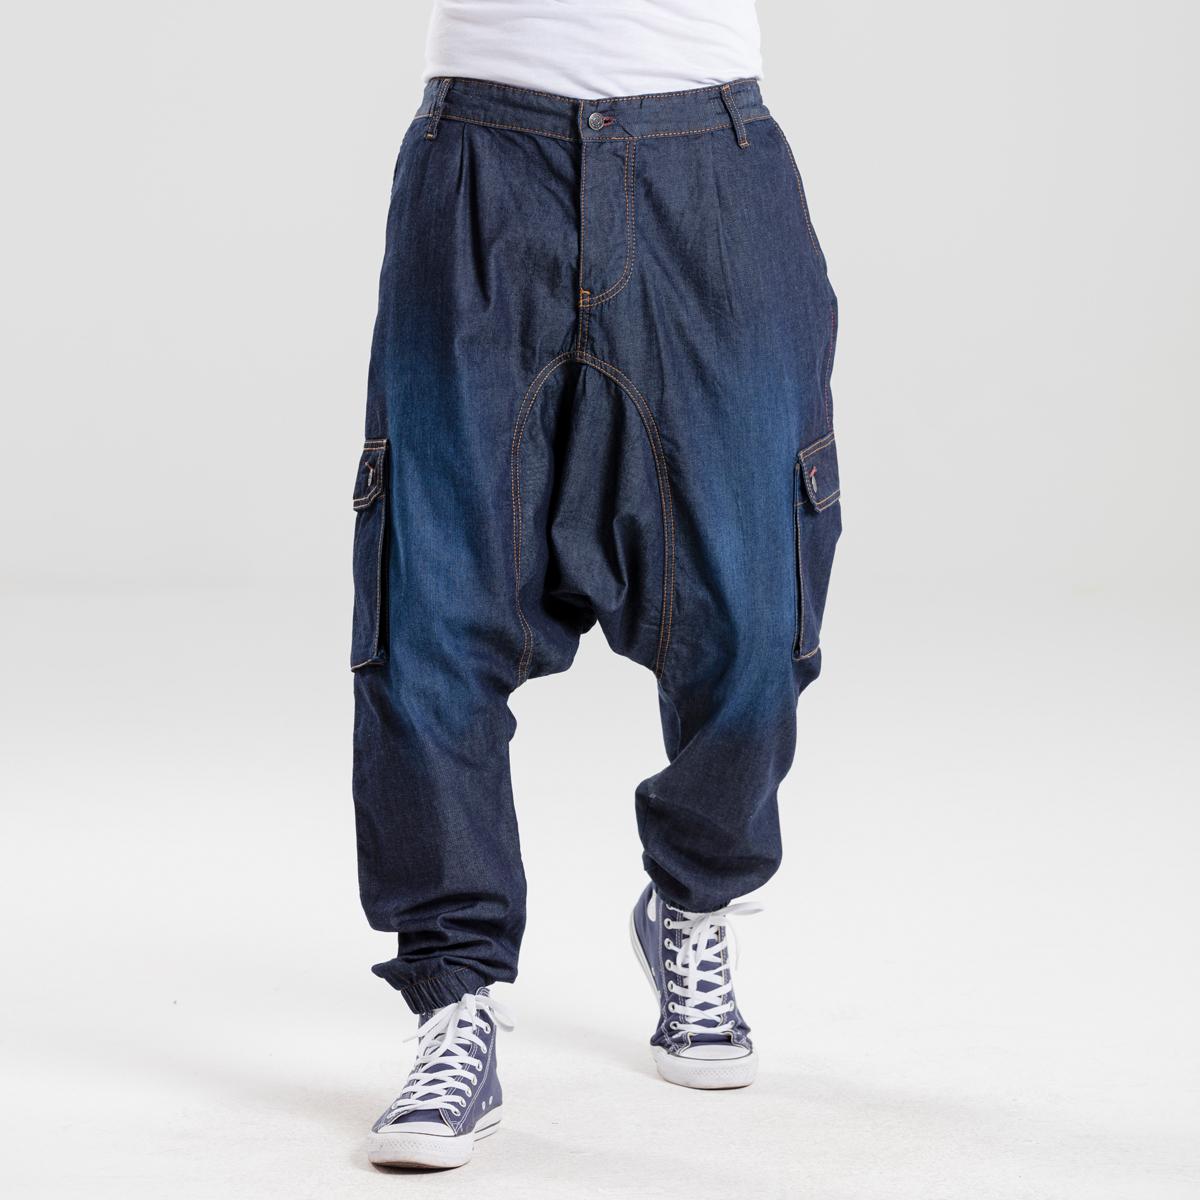 saroual battle evo jeans blue dcjeans face